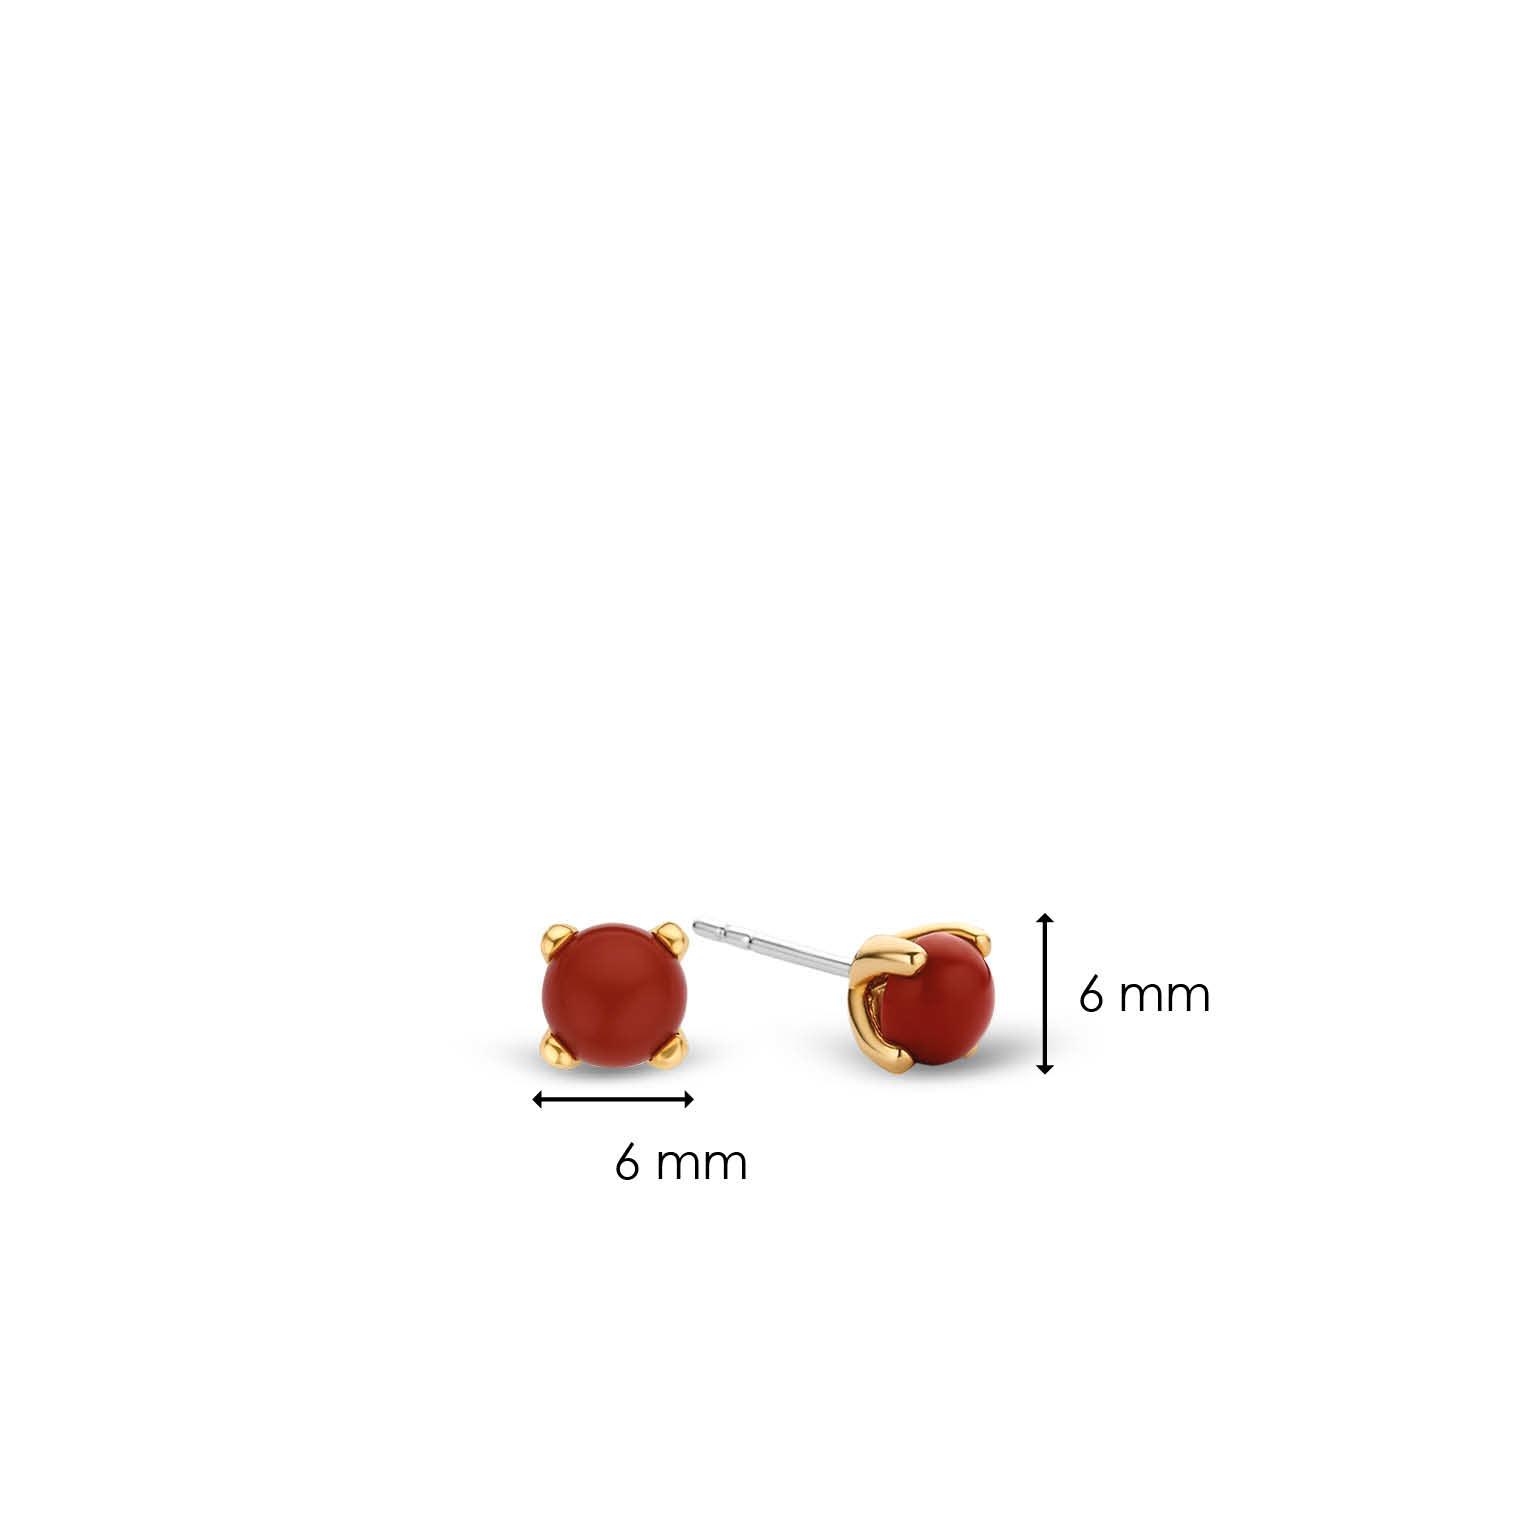 TI SENTO - Milano Earrings 7768CR-5